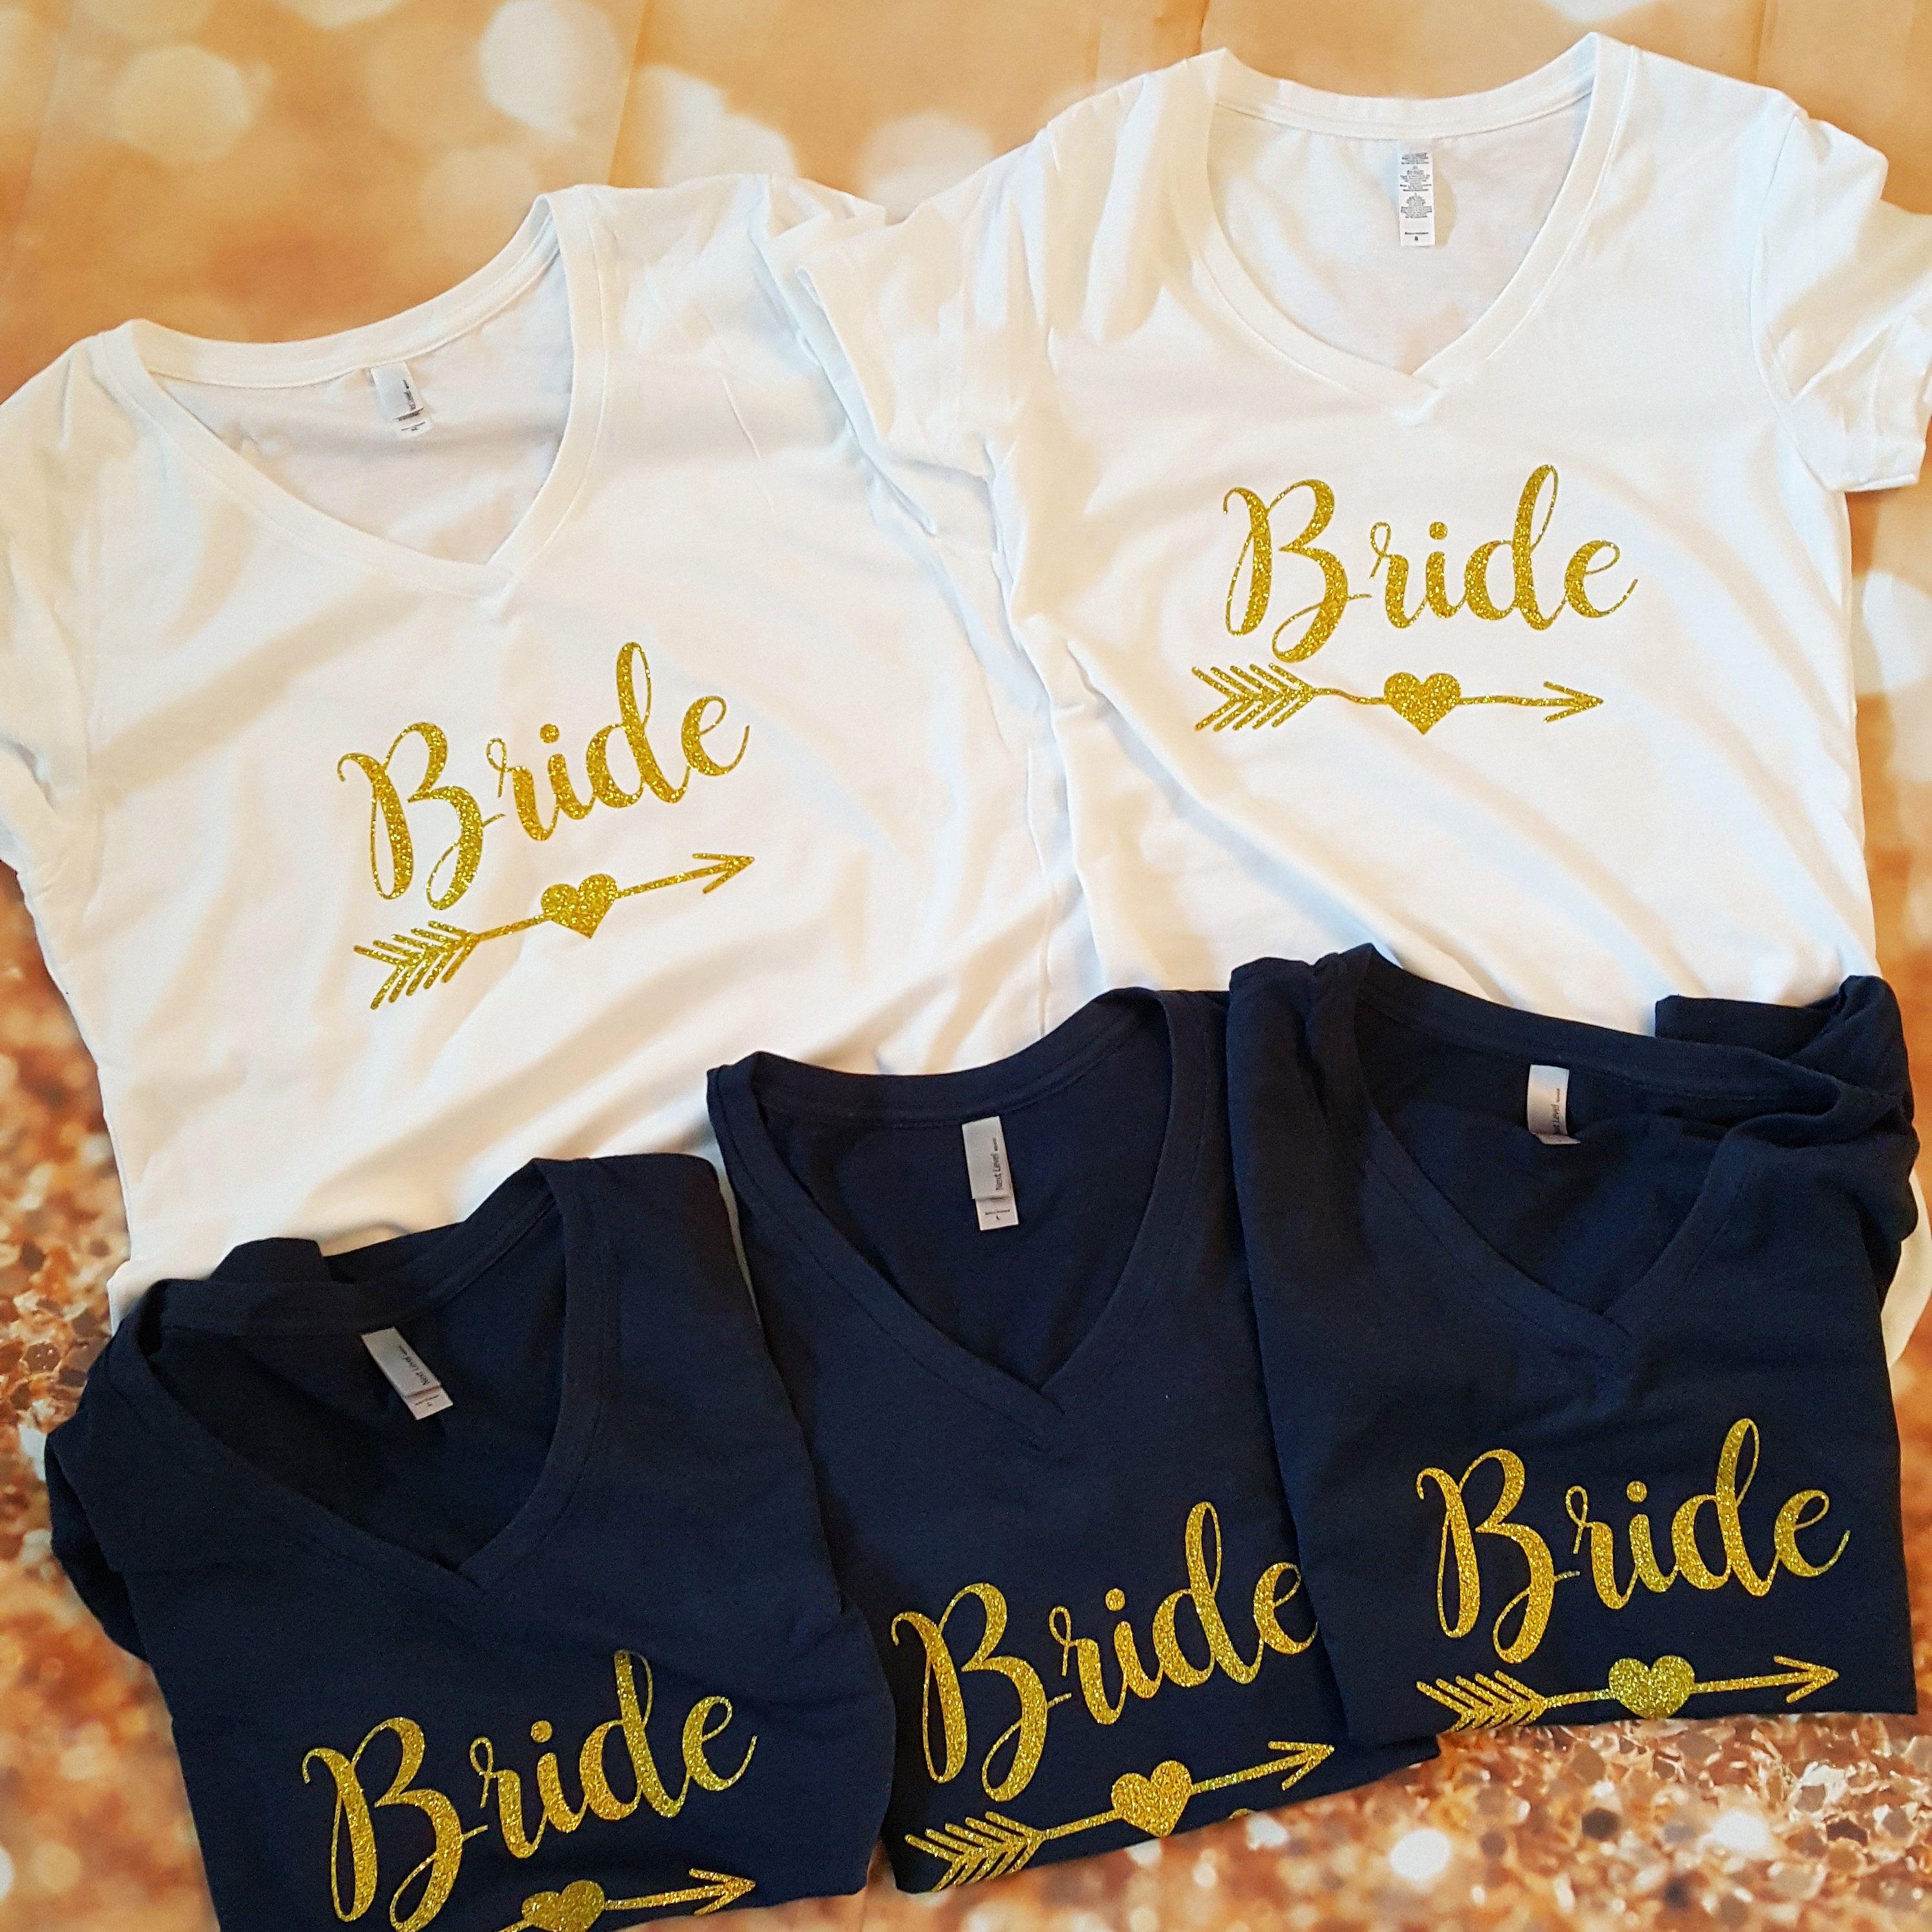 ac0b866e87733 Personalized Shirt-Bride Shirt-Wedding-Bride-Bridesmaid-Tribe-Team ...